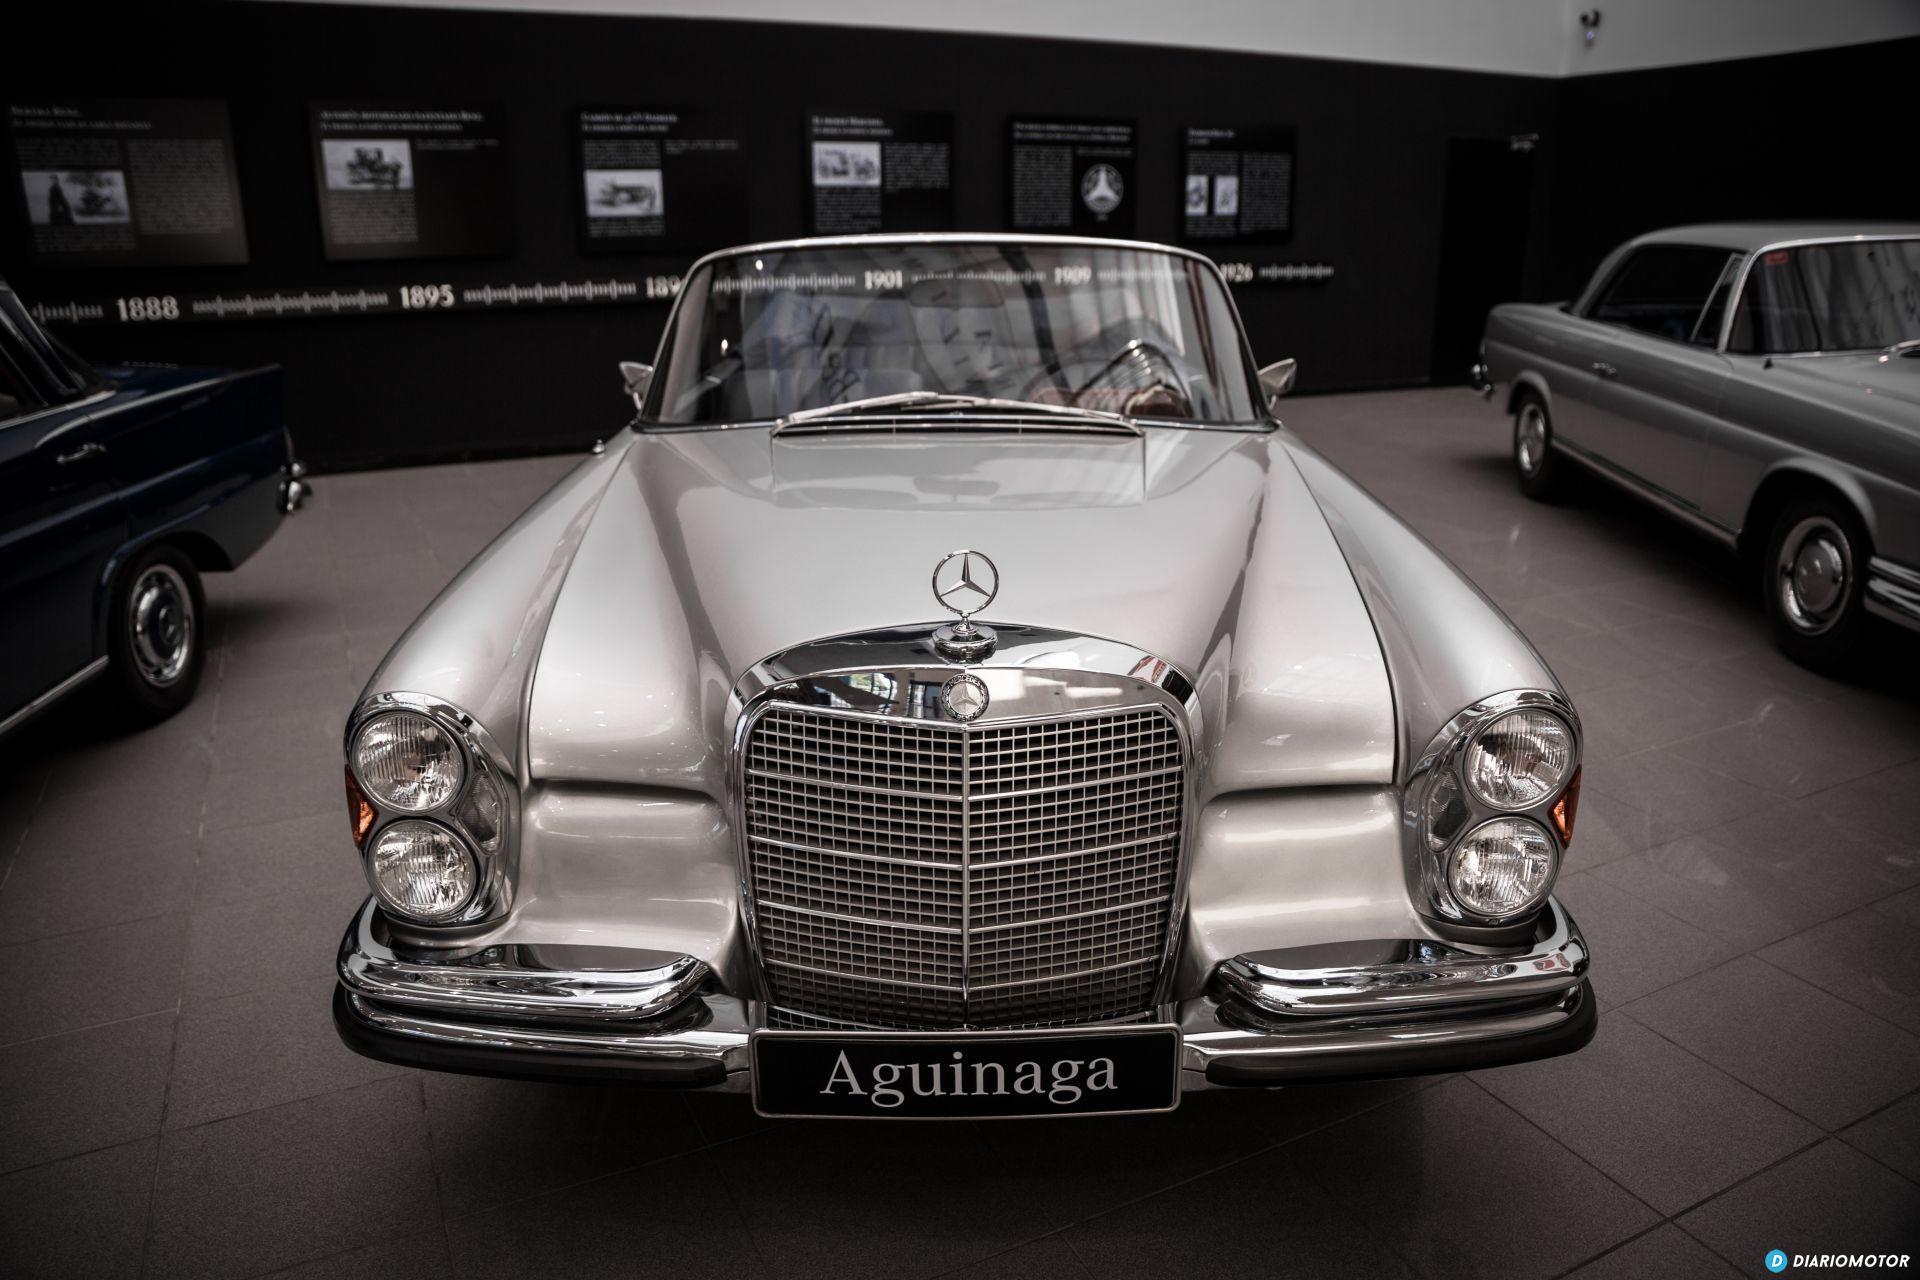 Museo Mercedes Aguinaga 8